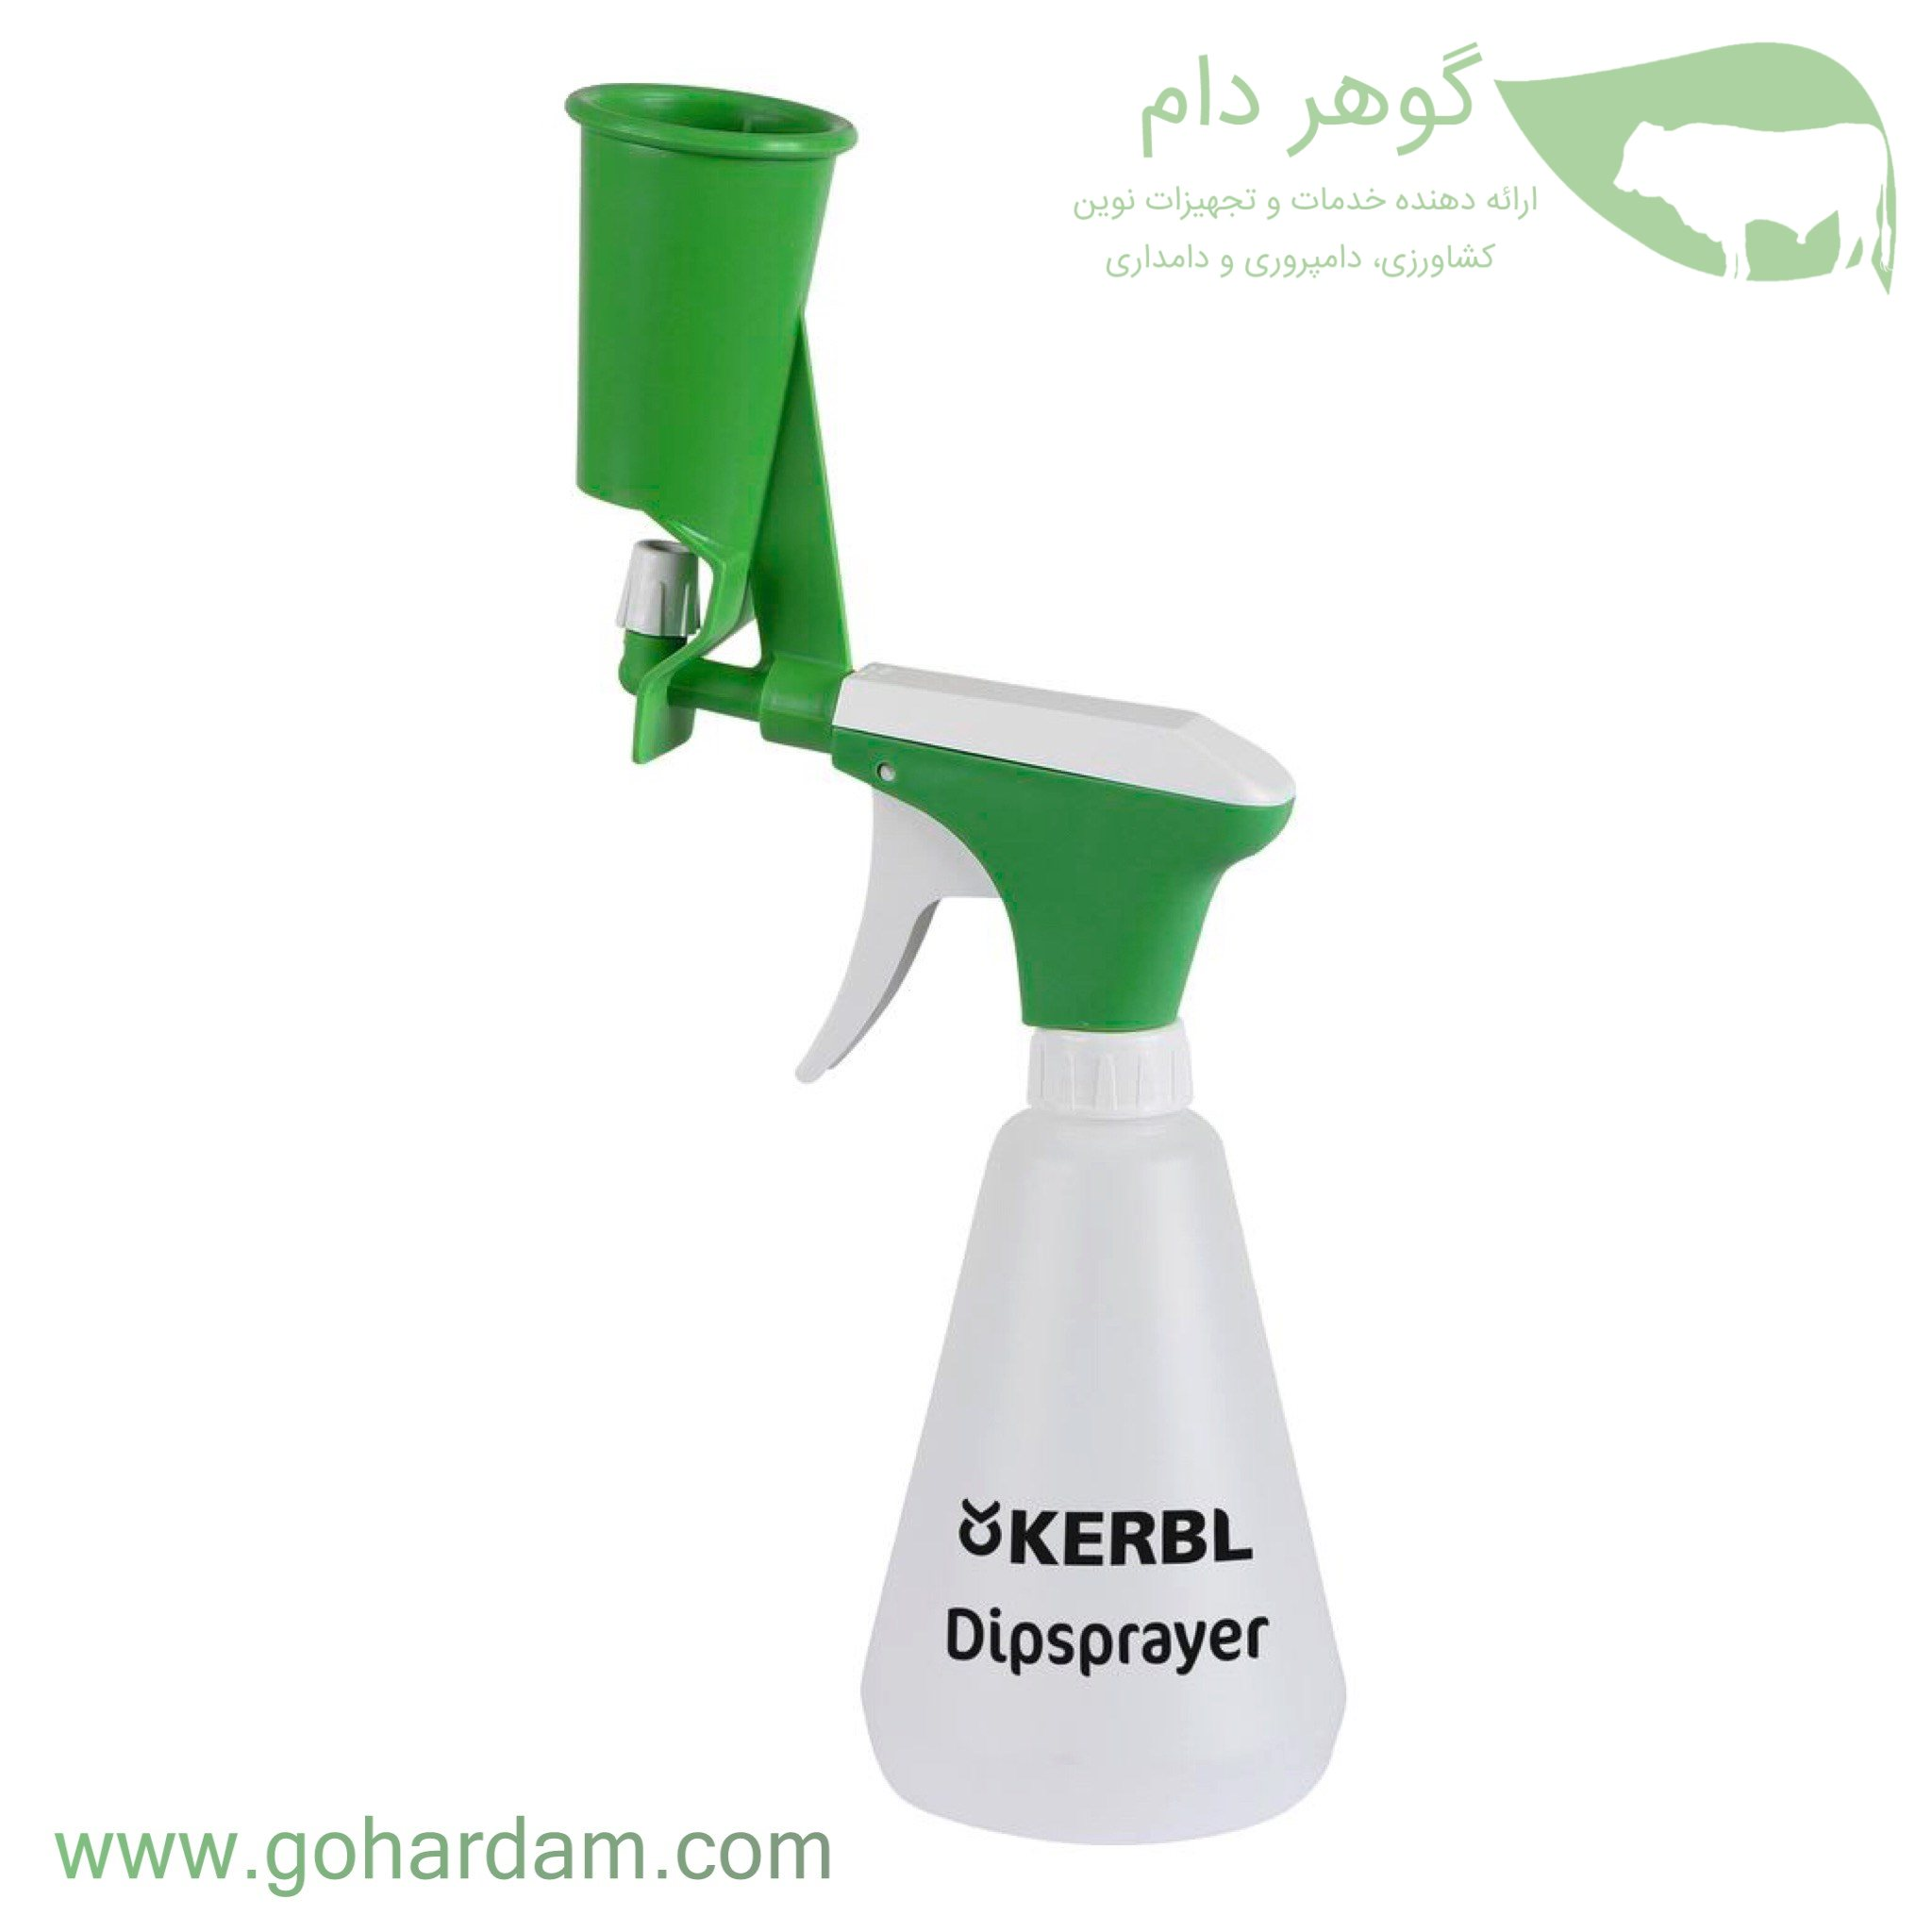 تیت اسپری کربل همراه با محفظه سرپستان گاو (KERBL Dip Sprayer with Teat Cup)